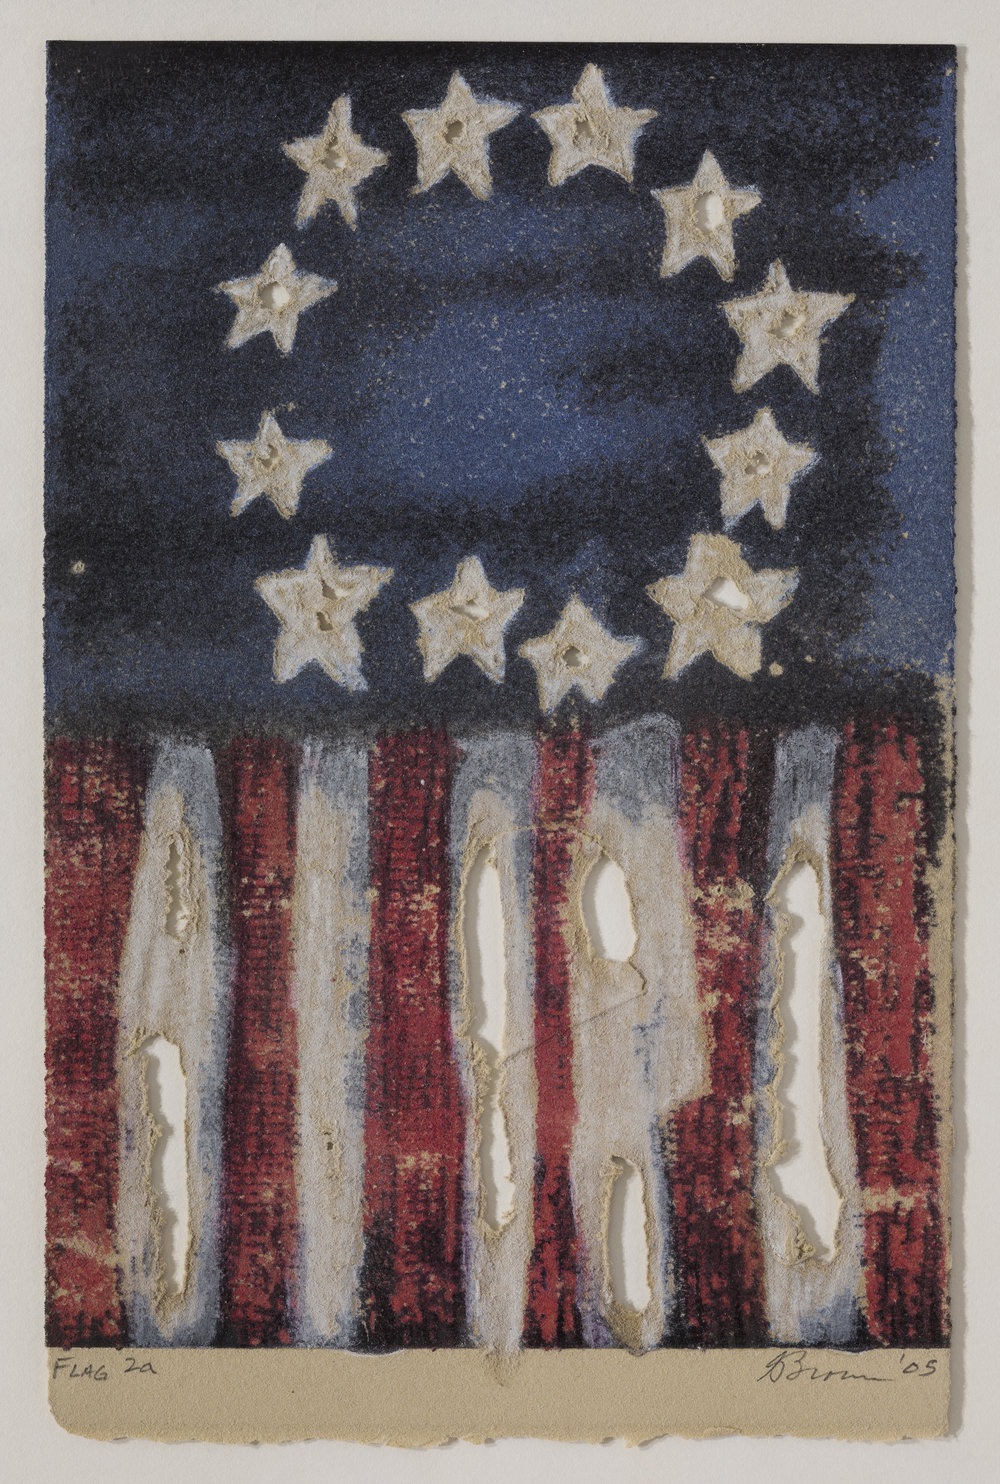 Flag 2a